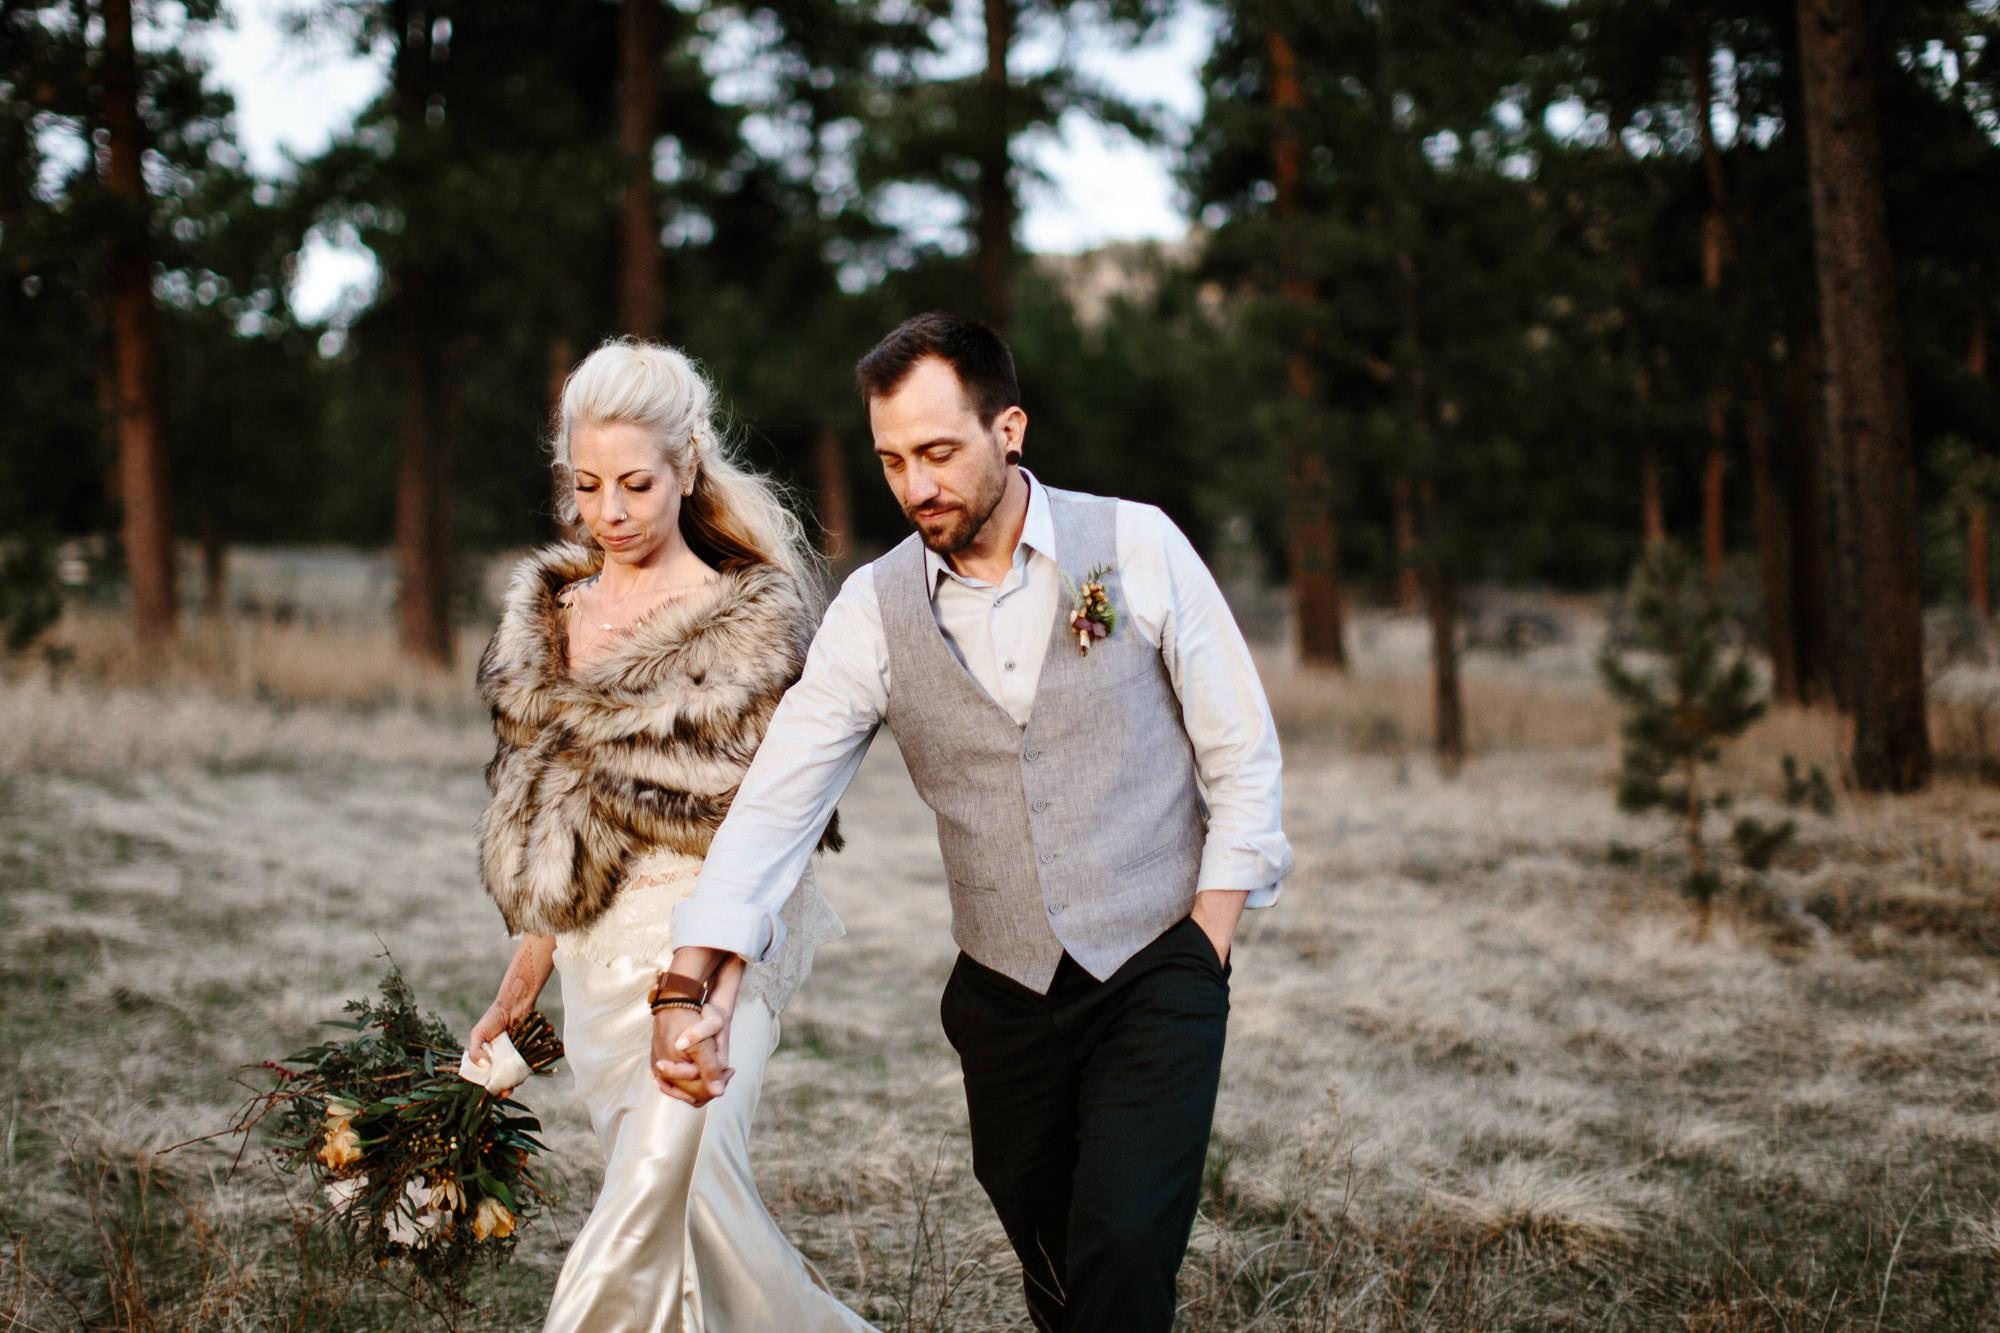 bucci-barn-wedding-elopement-evergreen-boulder-denver-colorado-adventerous-romantic-timeless-099.jpg